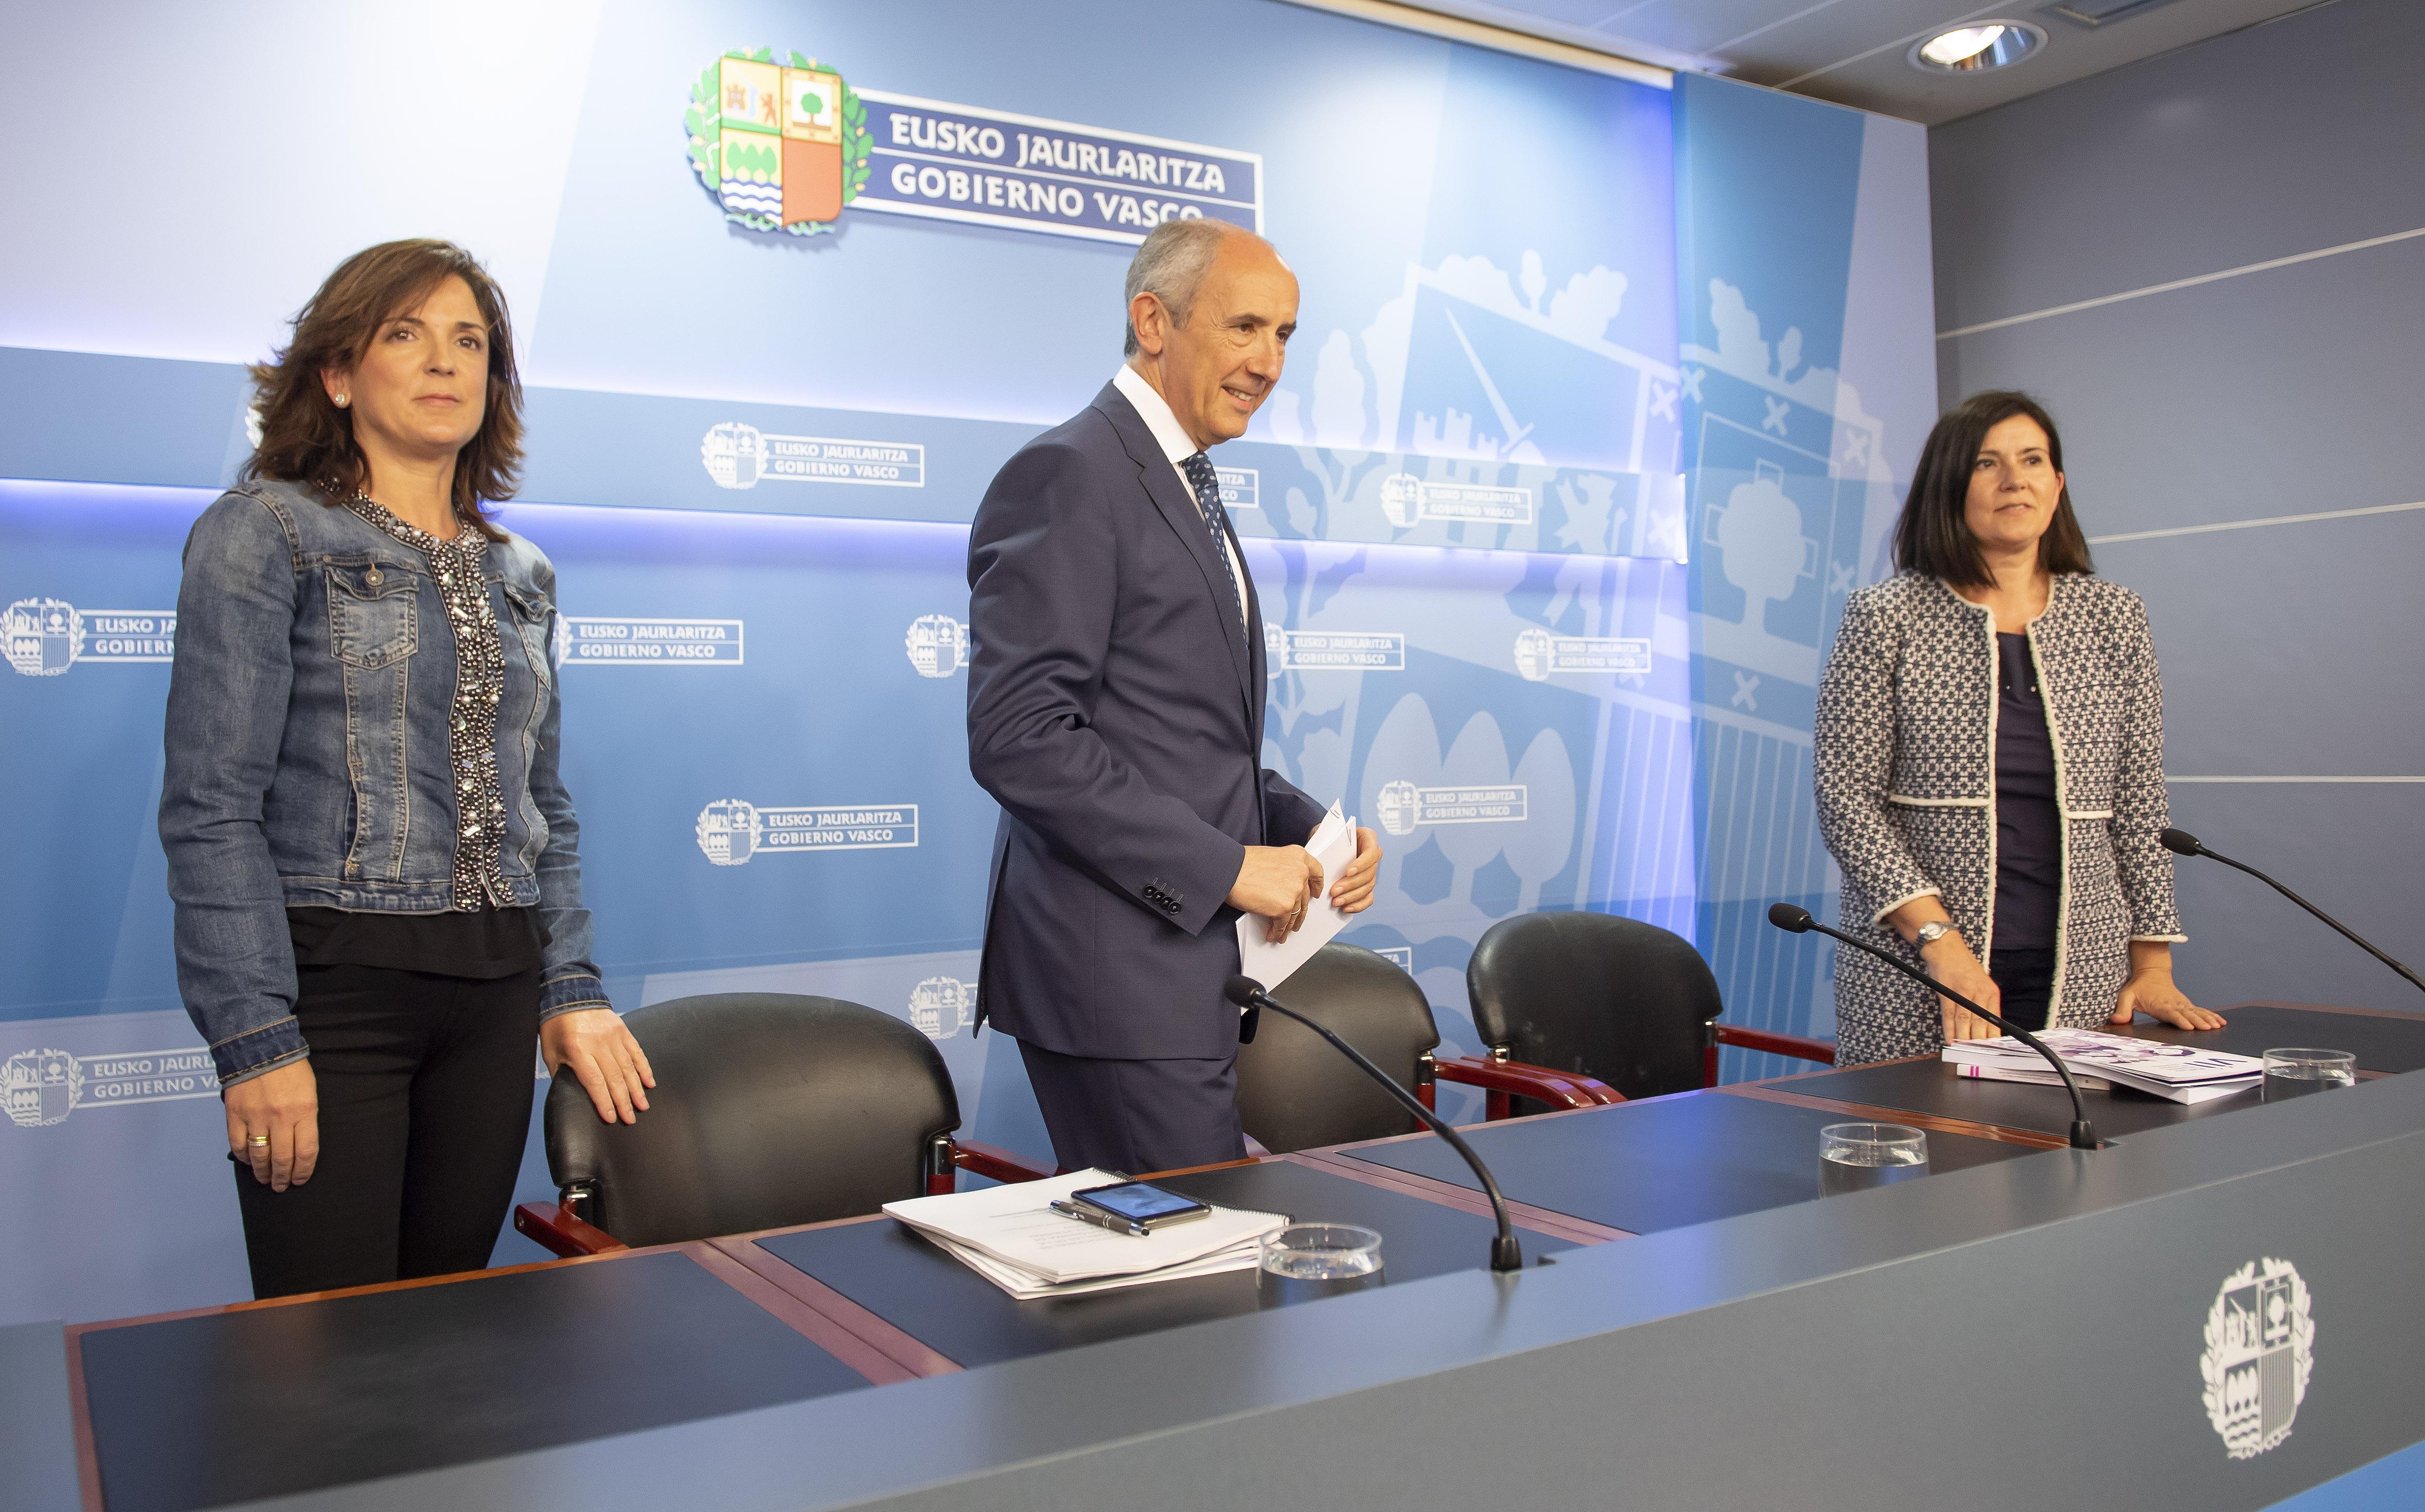 2018_06_19_consejo_gobierno_03.jpg